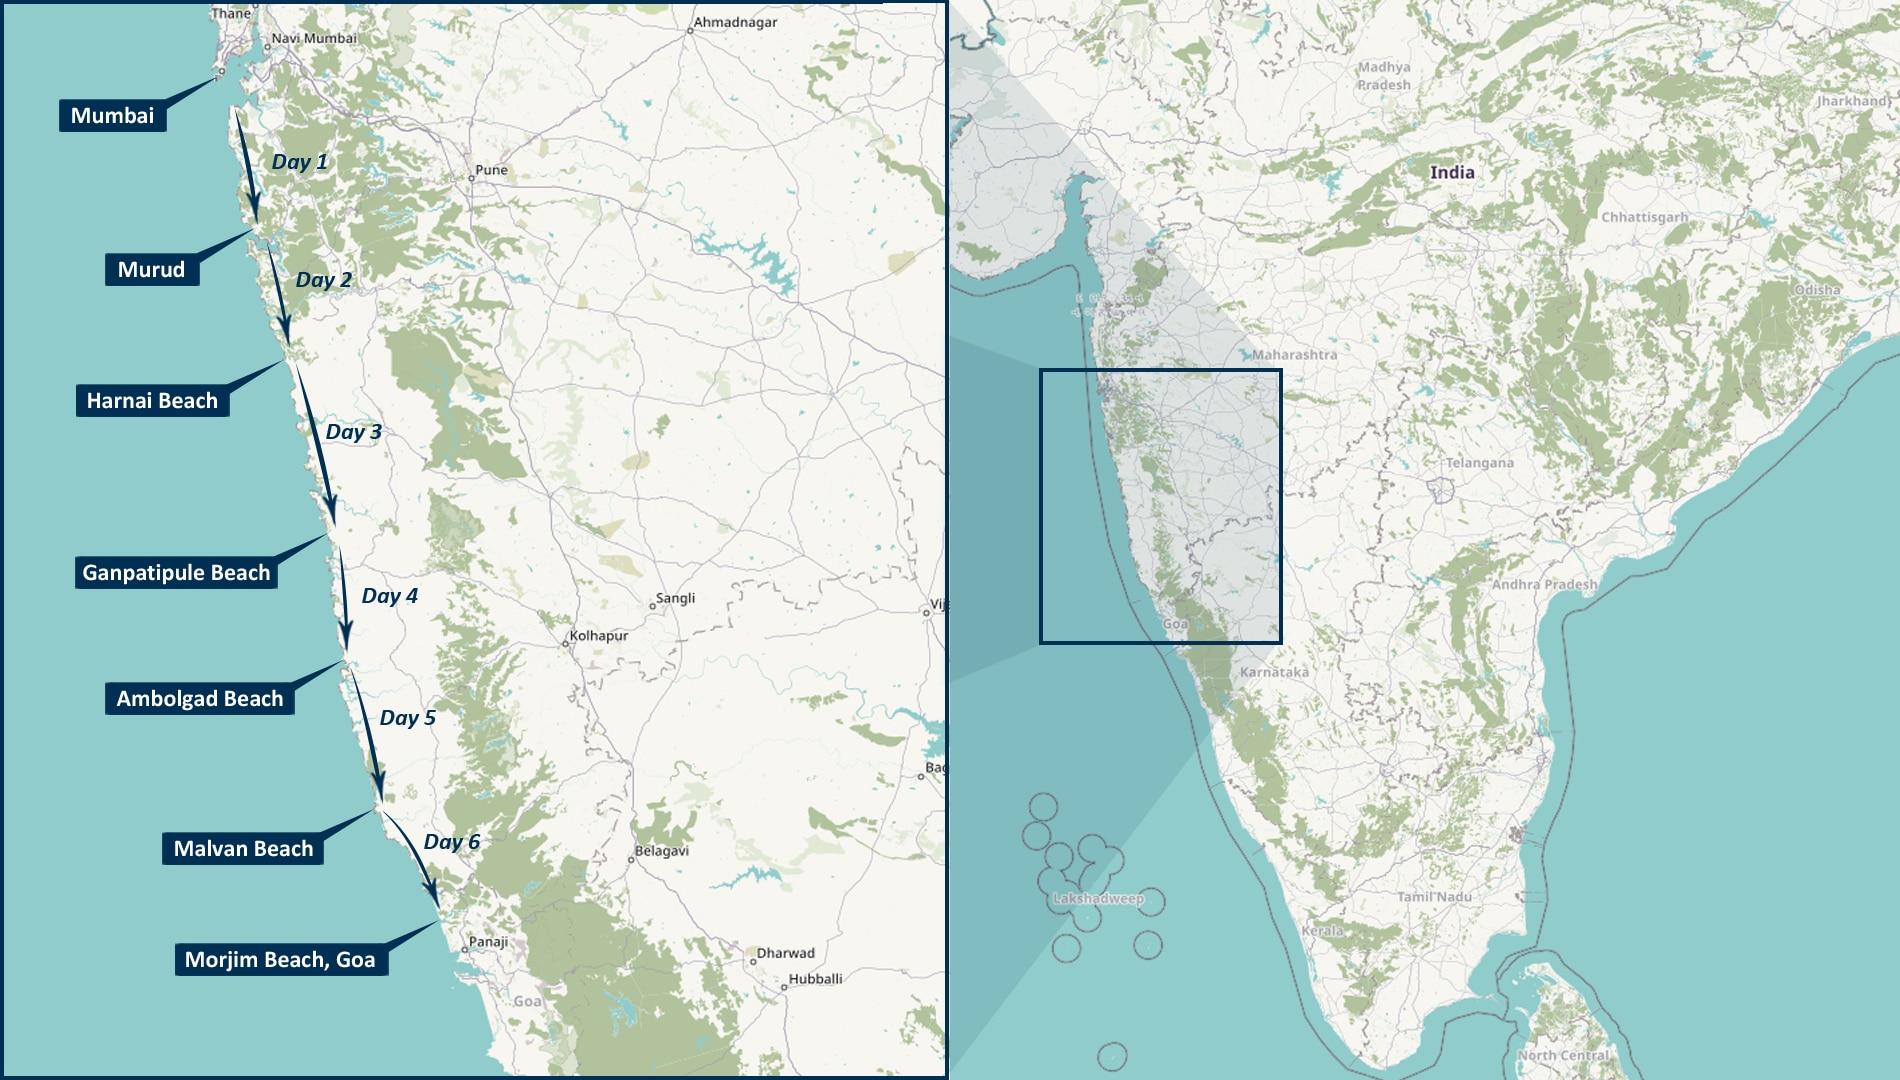 Mumbai to Goa 6-day cycle touring holiday